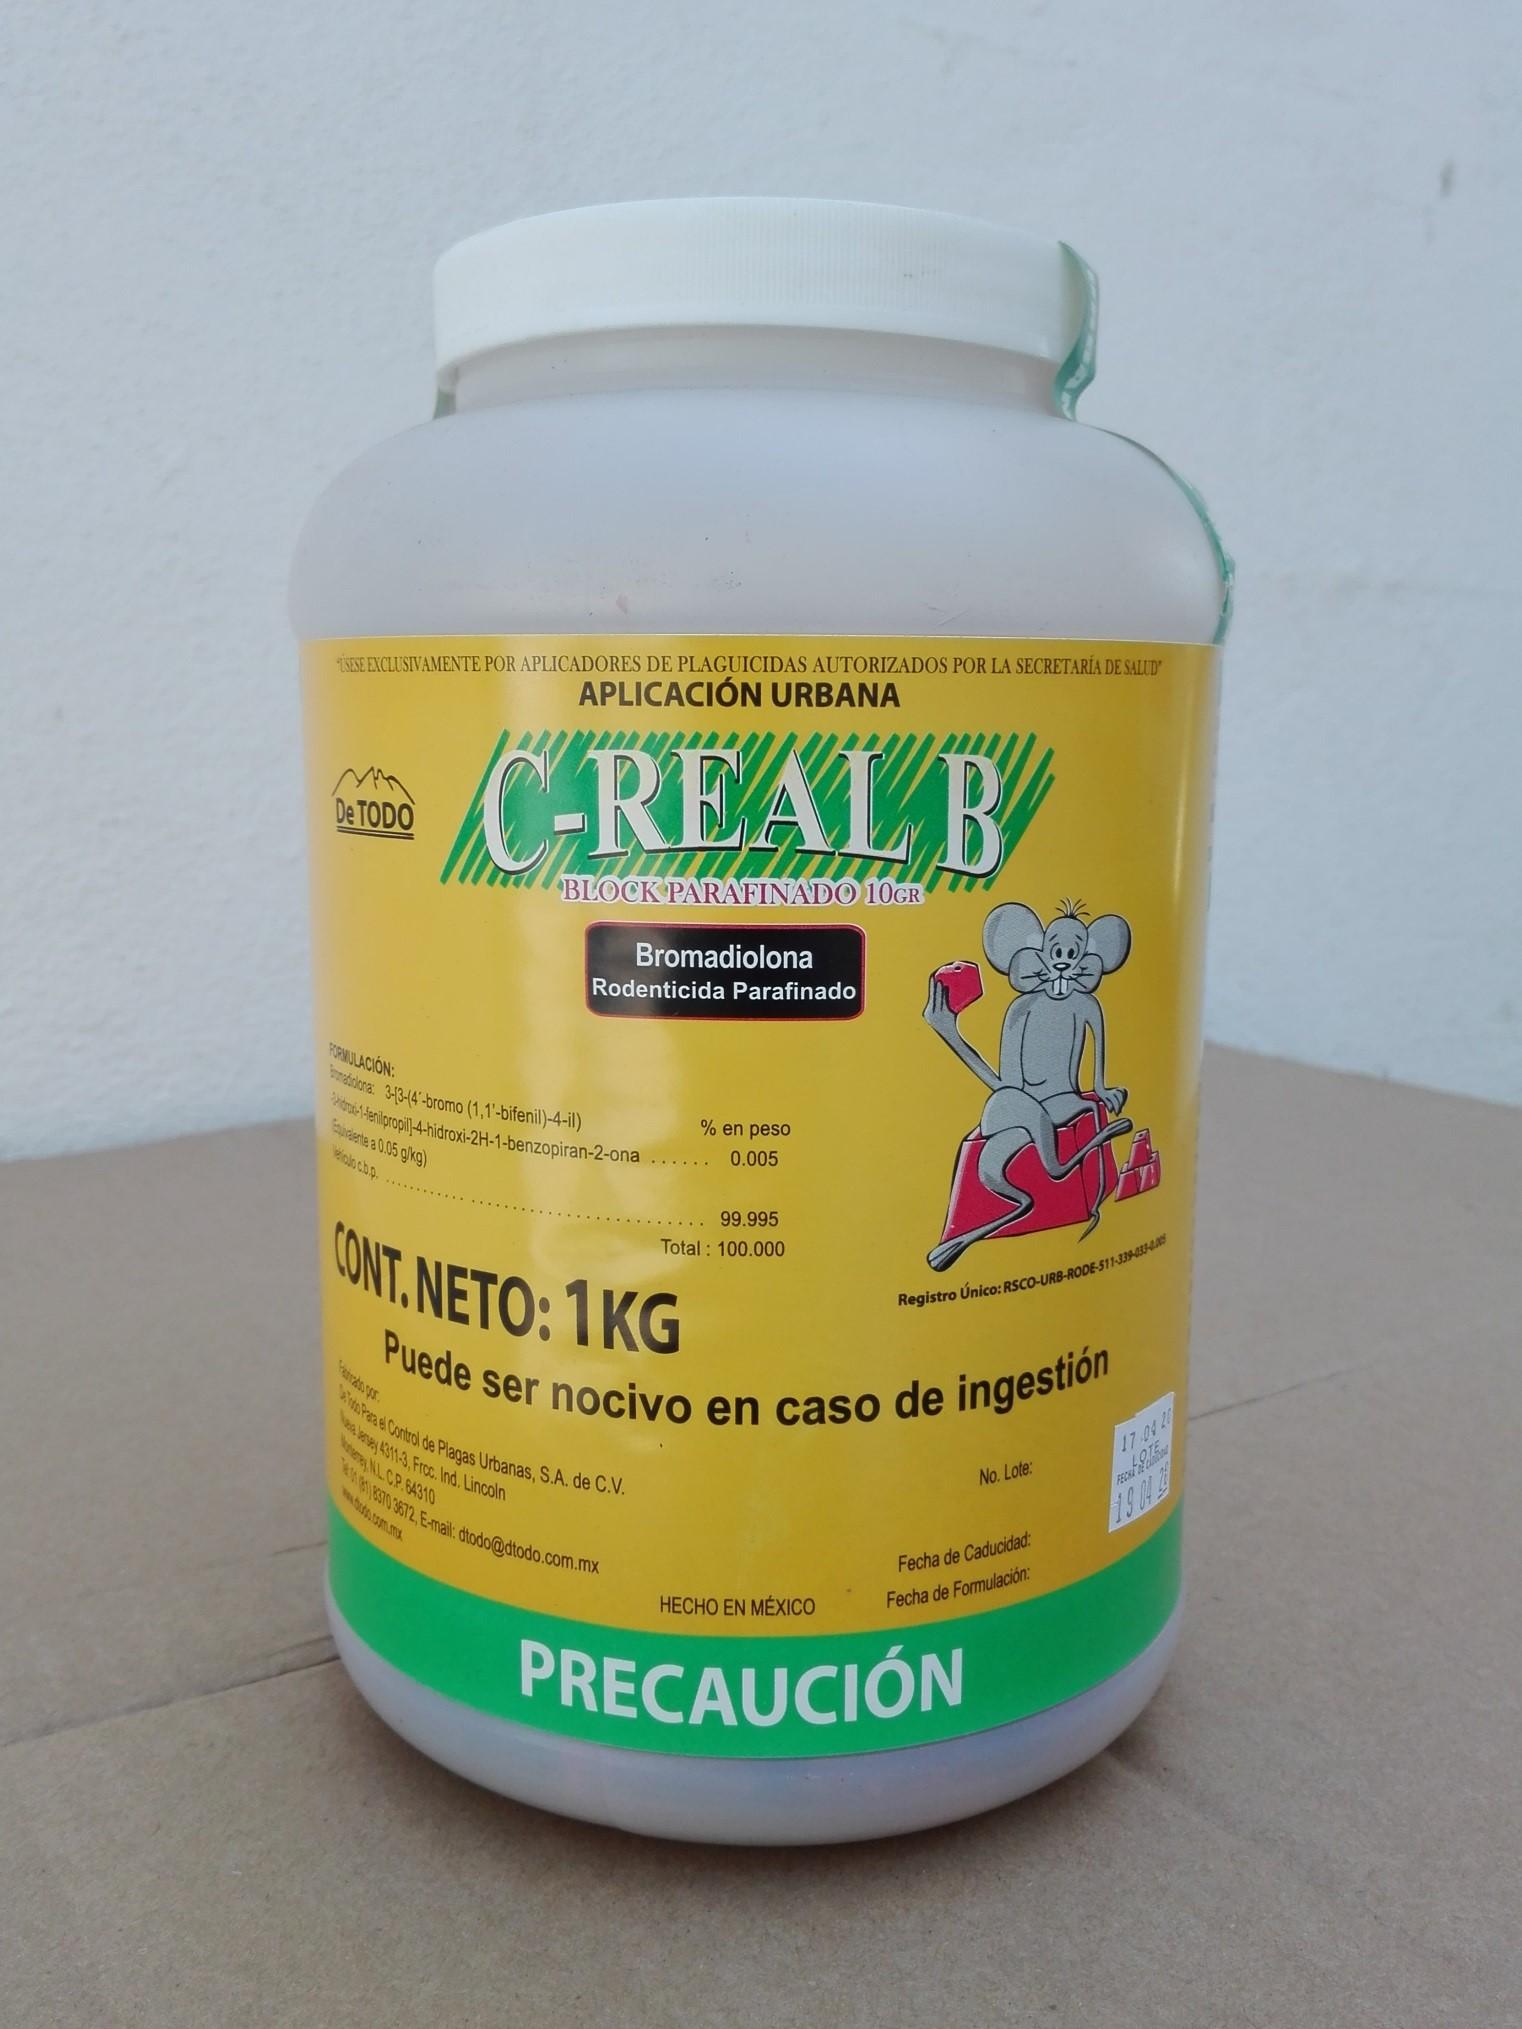 C-REAL B 2